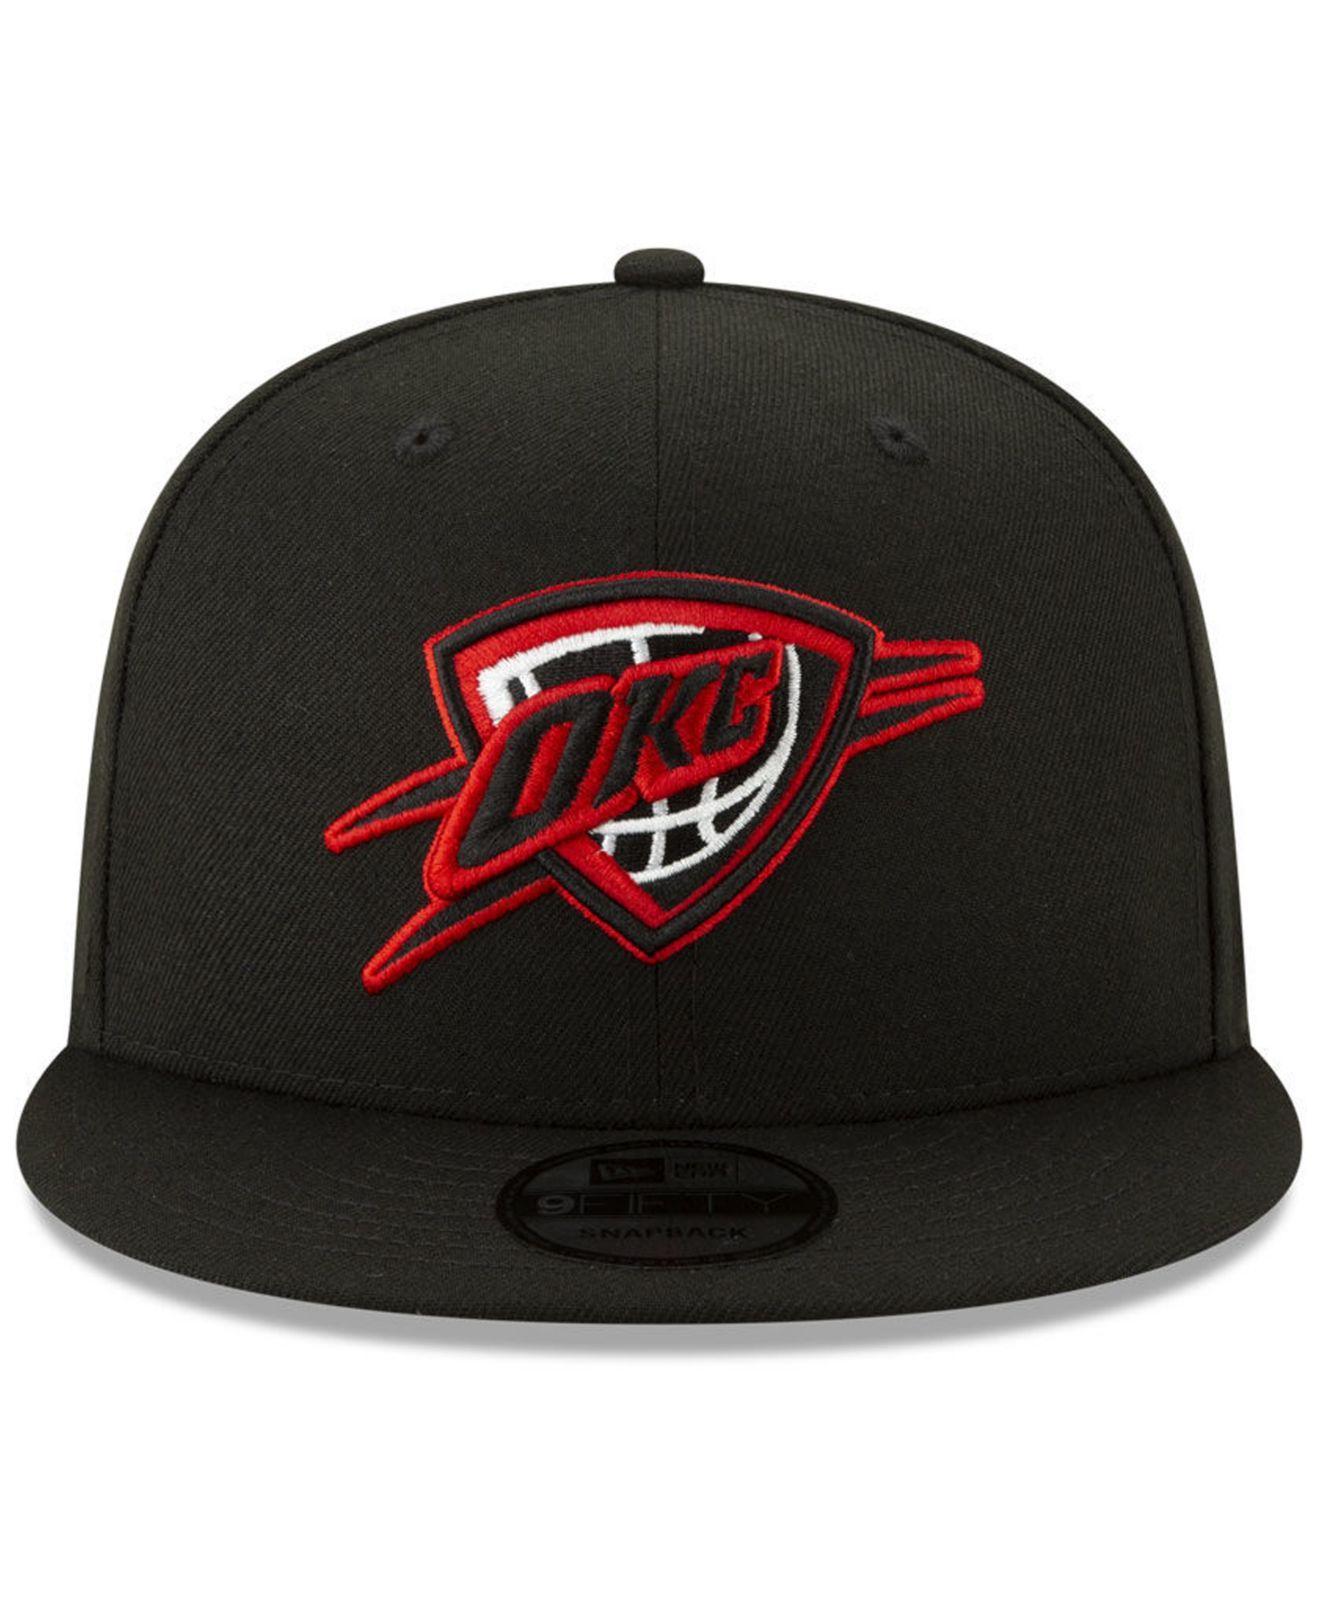 the best attitude a3e64 dae7e ireland lyst ktz oklahoma city thunder the bred man 9fifty snapback cap in  black for men